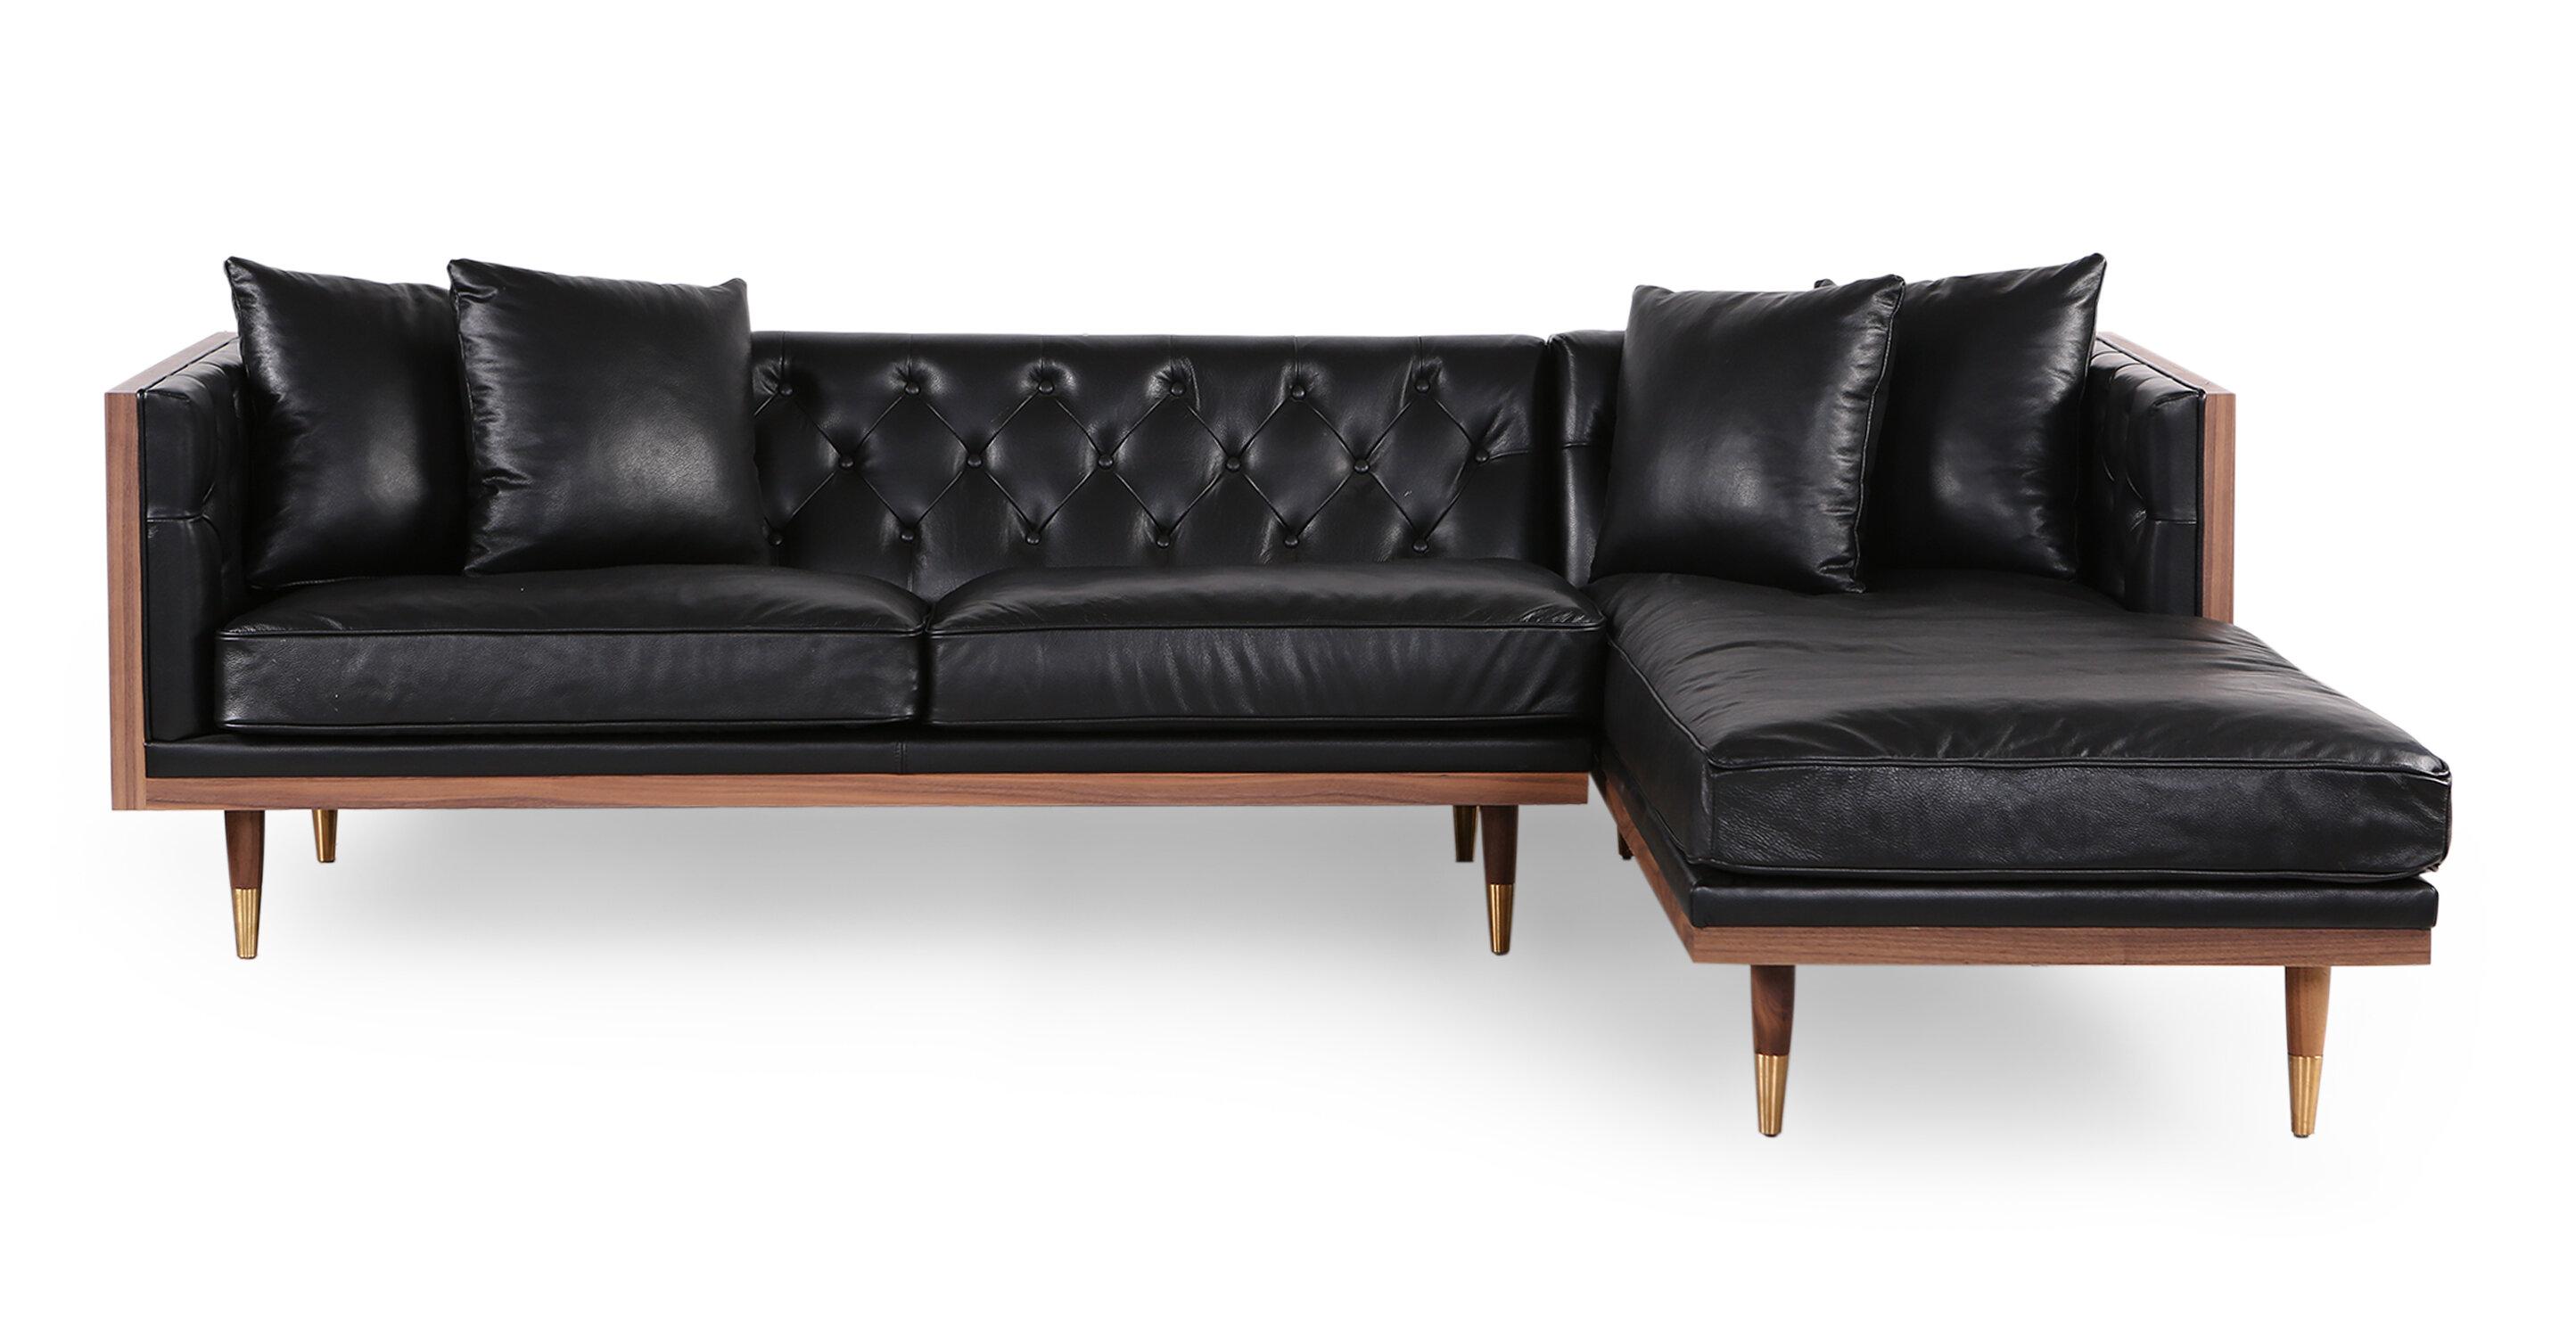 Groovy Leyla Mid Century Sectional Theyellowbook Wood Chair Design Ideas Theyellowbookinfo